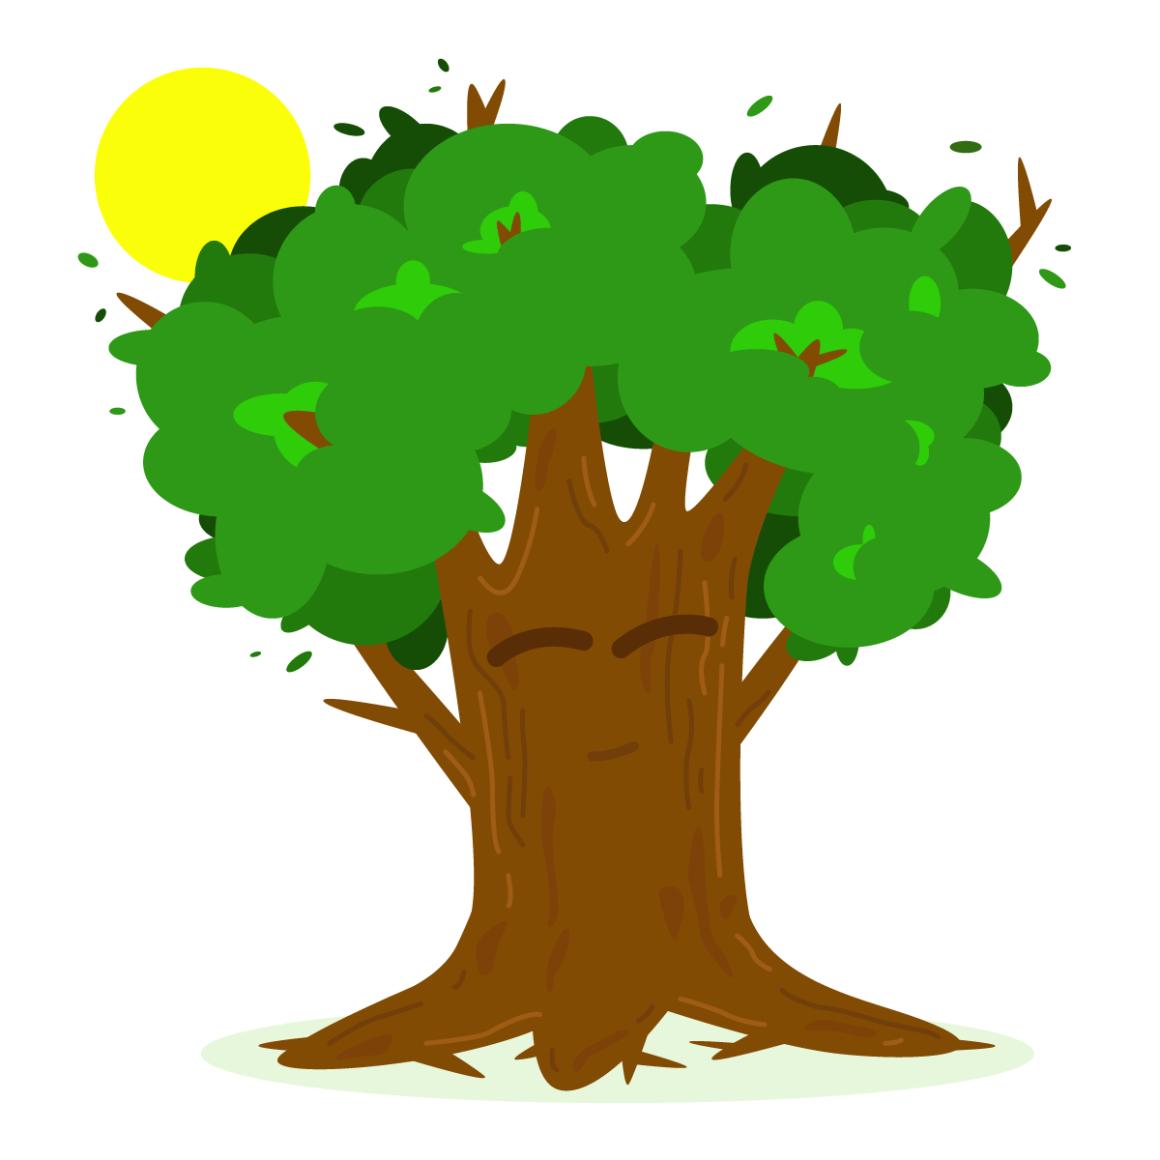 The Tree (Swedian Lie)